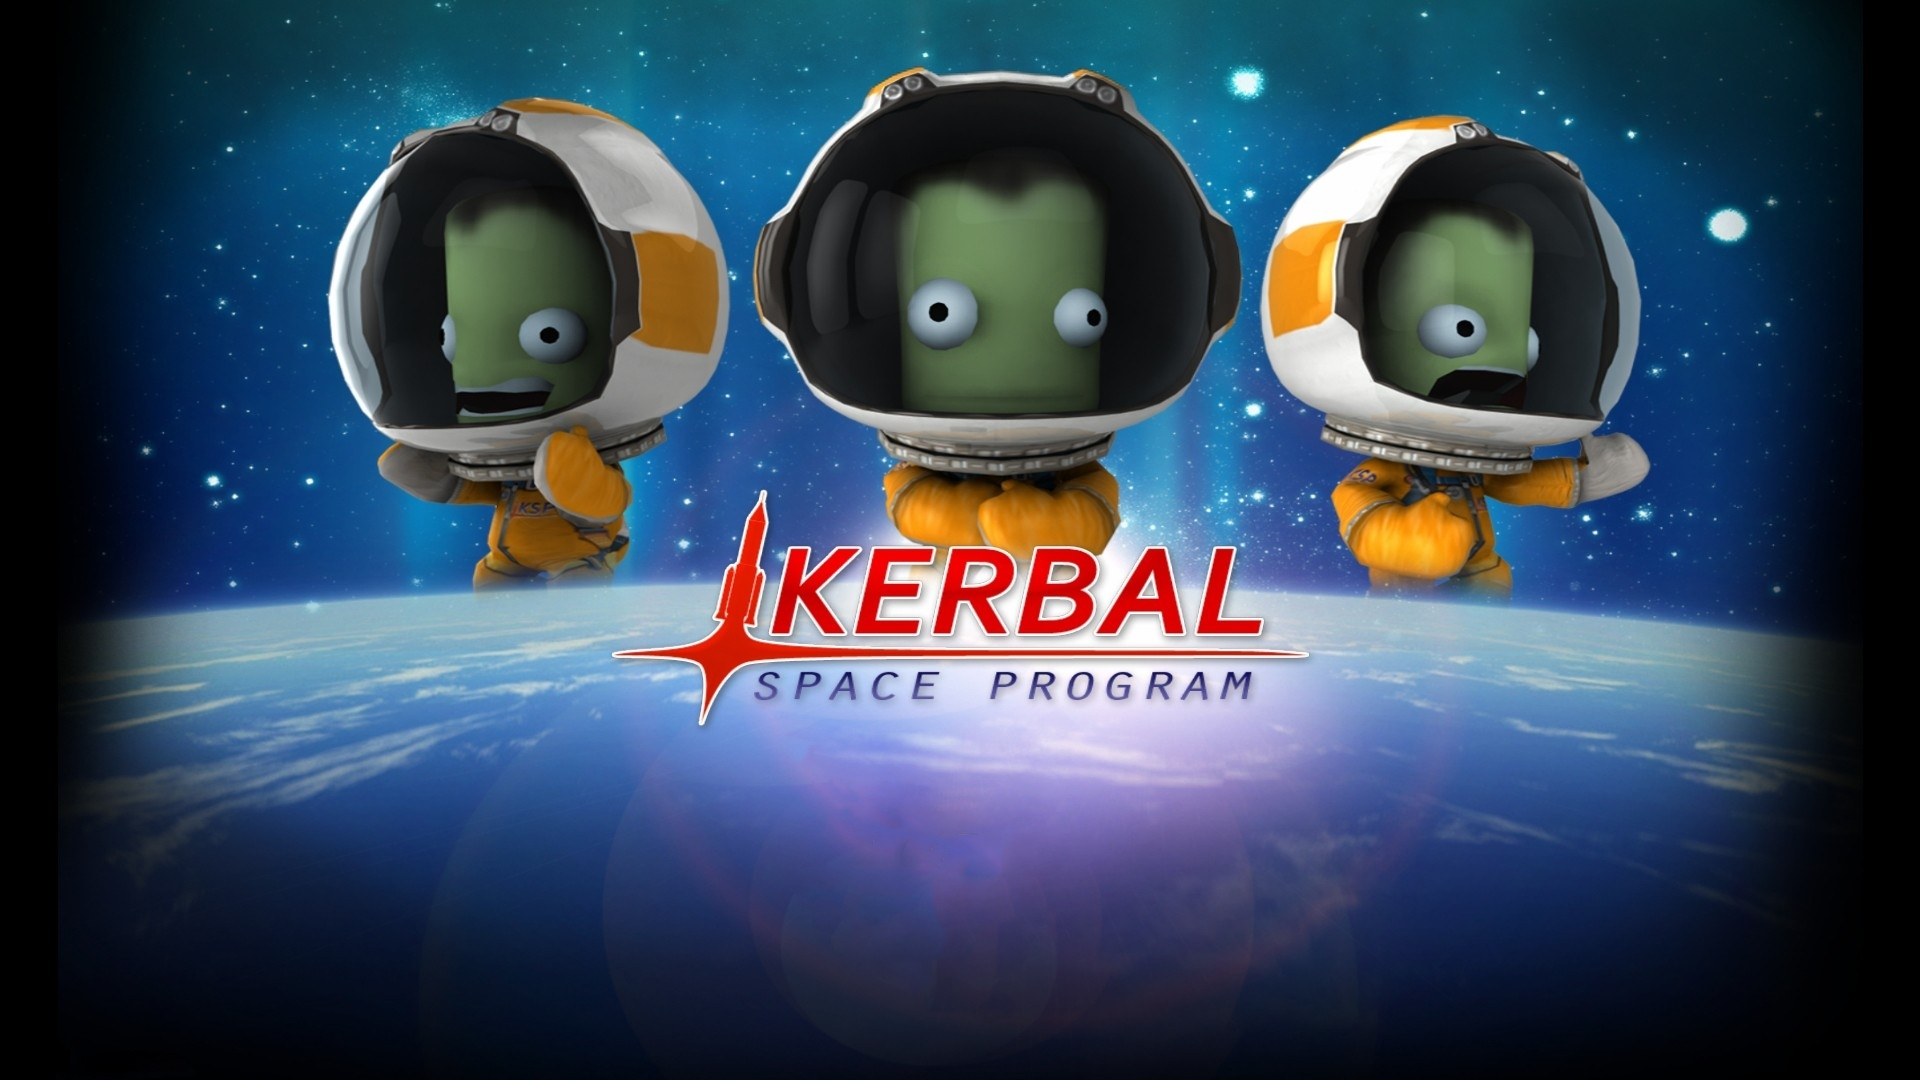 Kerbal-Space-Program-download-xgamex